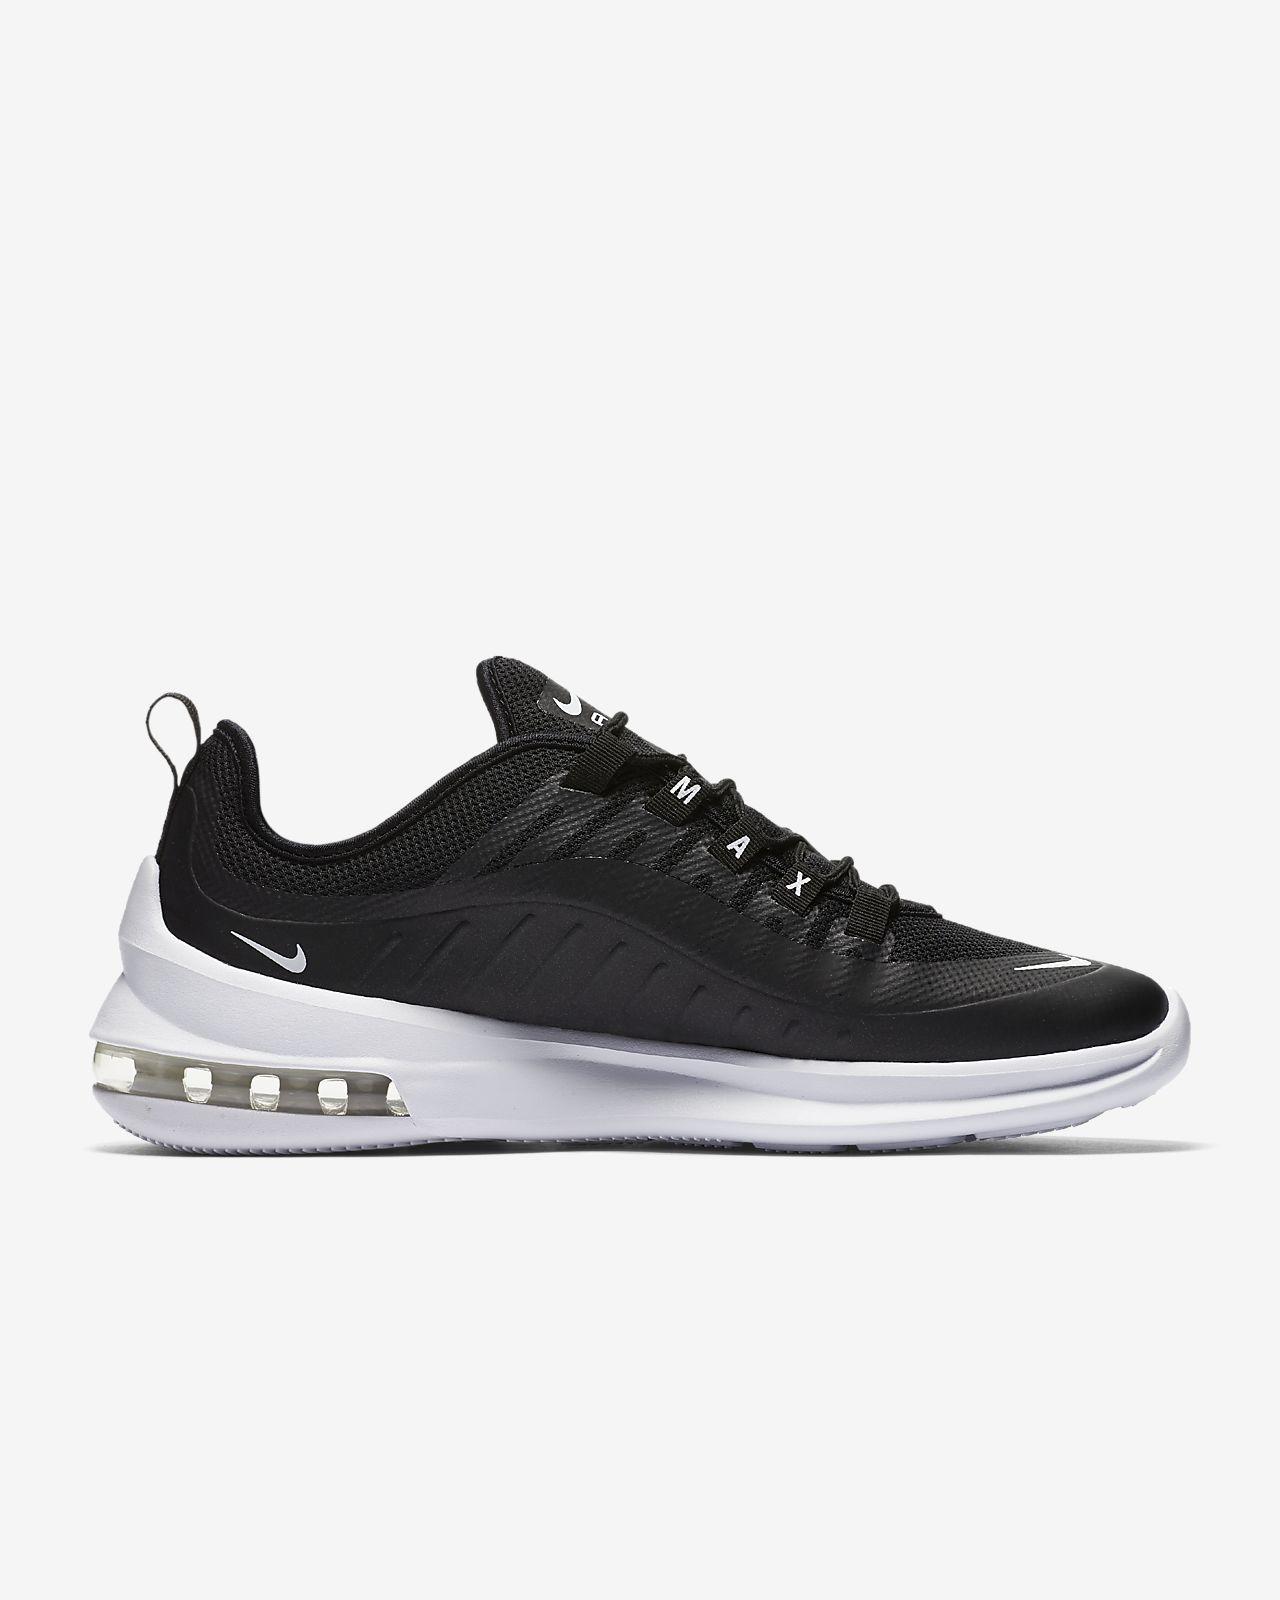 WMNS Nike Air Max Thea men's shoes white black